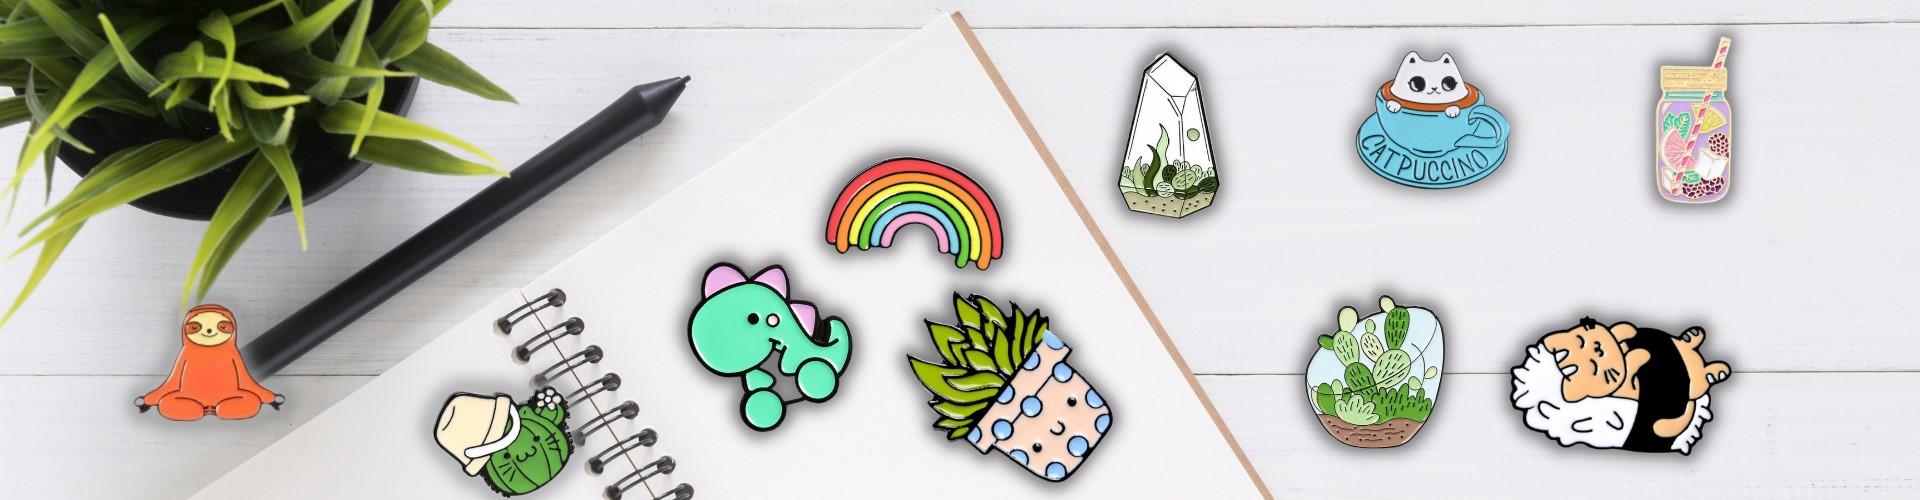 Banner pins